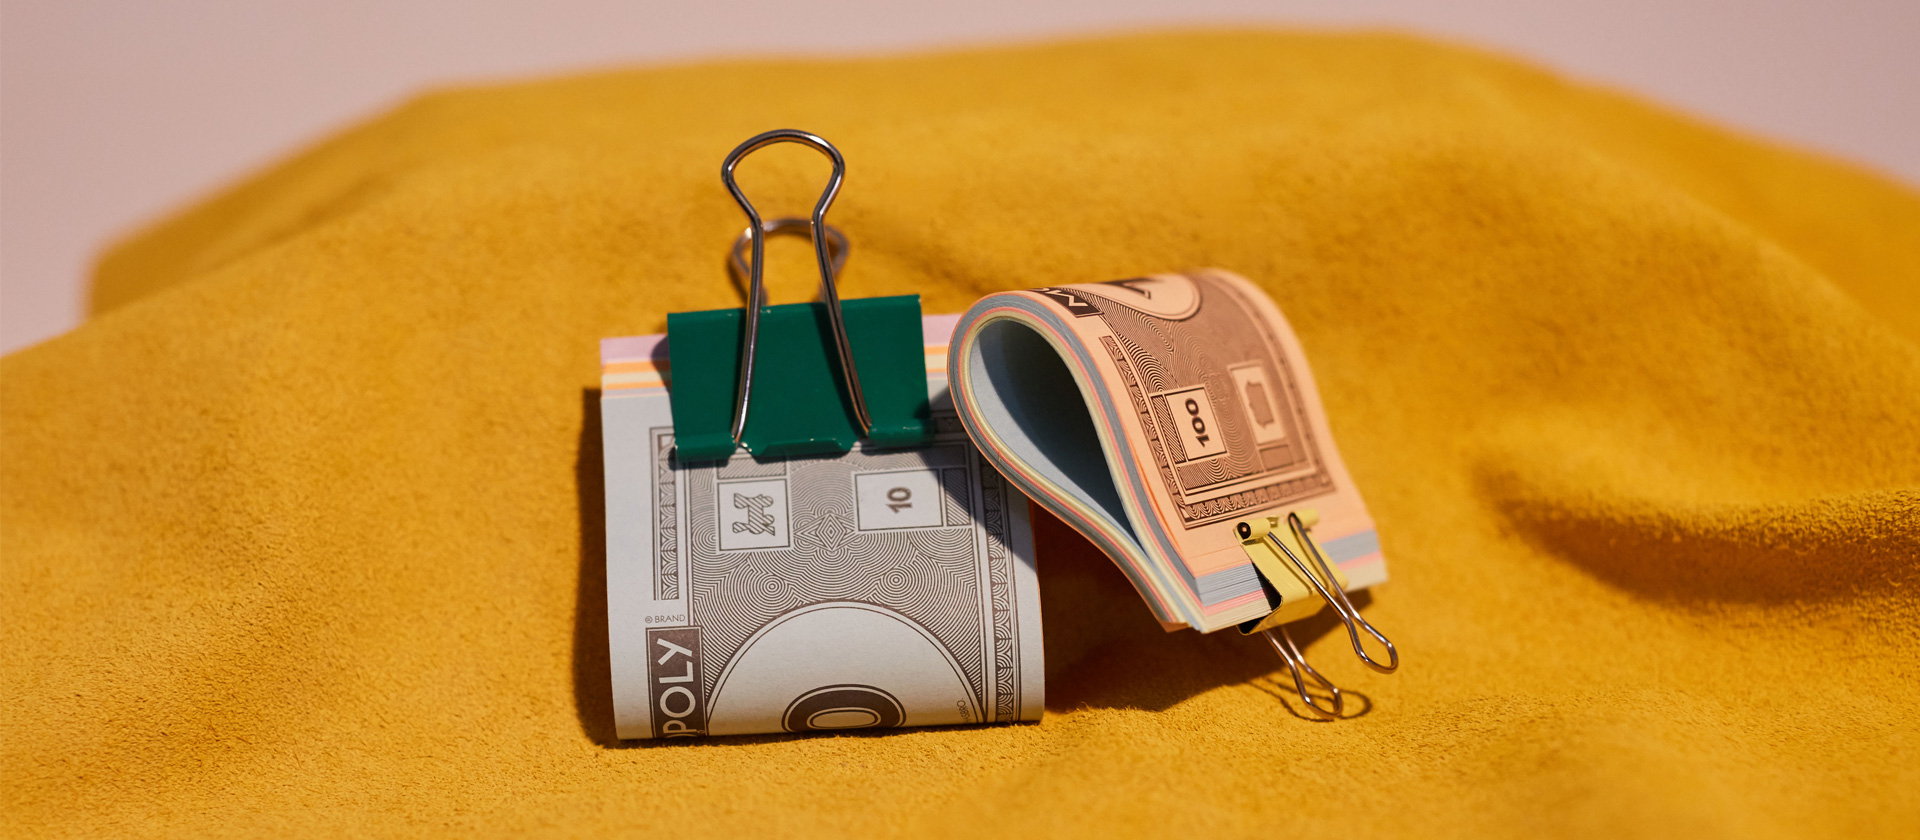 6 Surprising Ways To Improve Your Credit Score